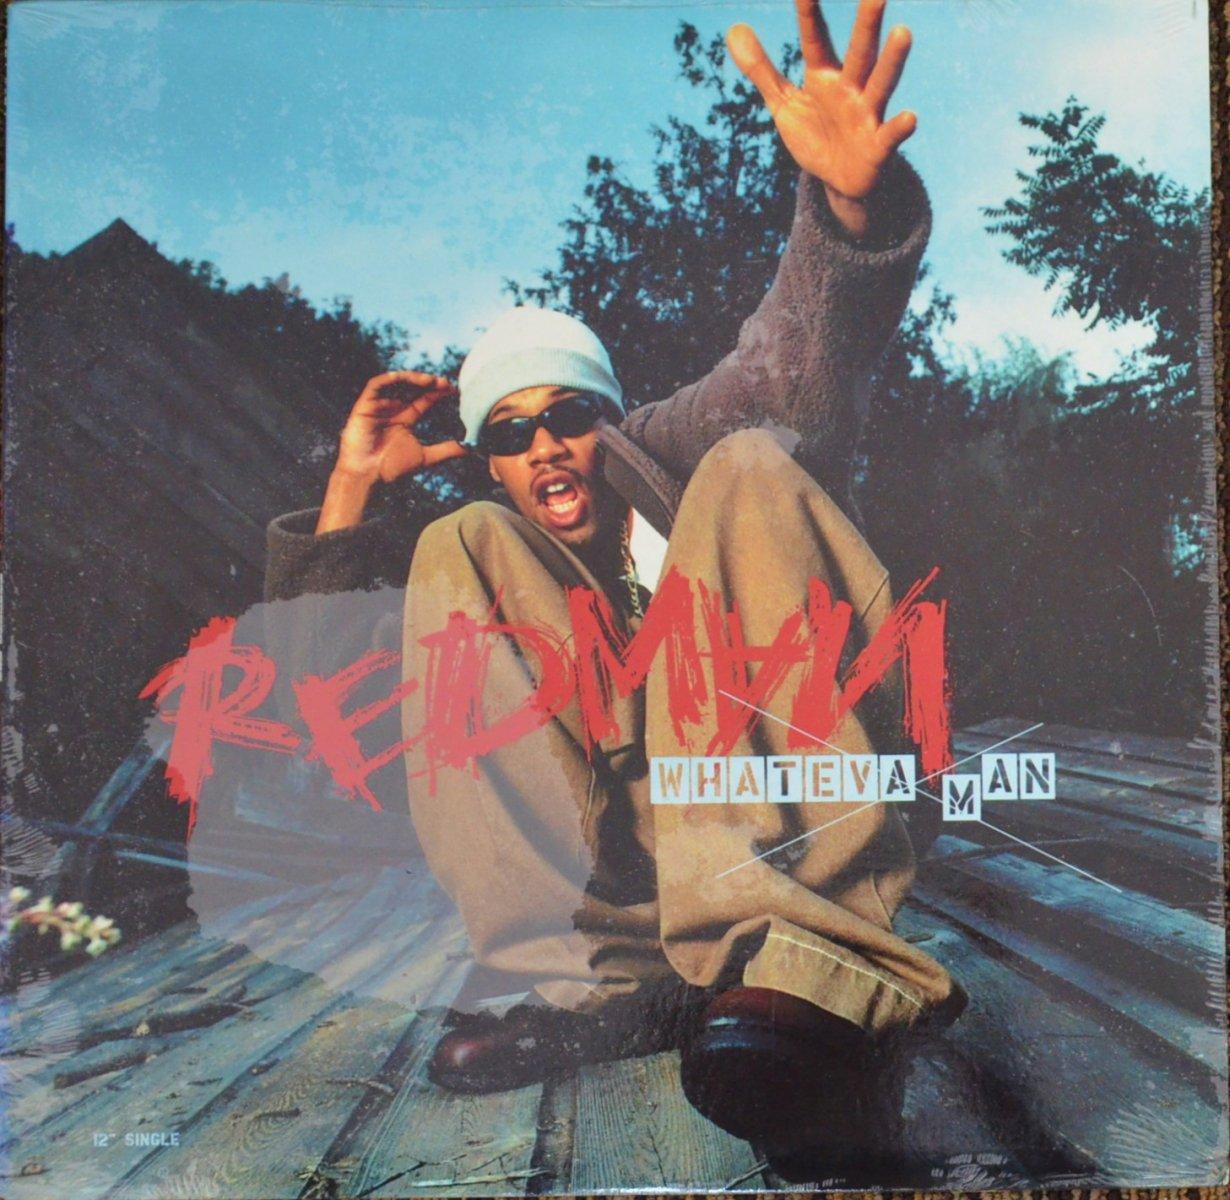 REDMAN / WHATEVA MAN / SMOKE BUDDAH (12